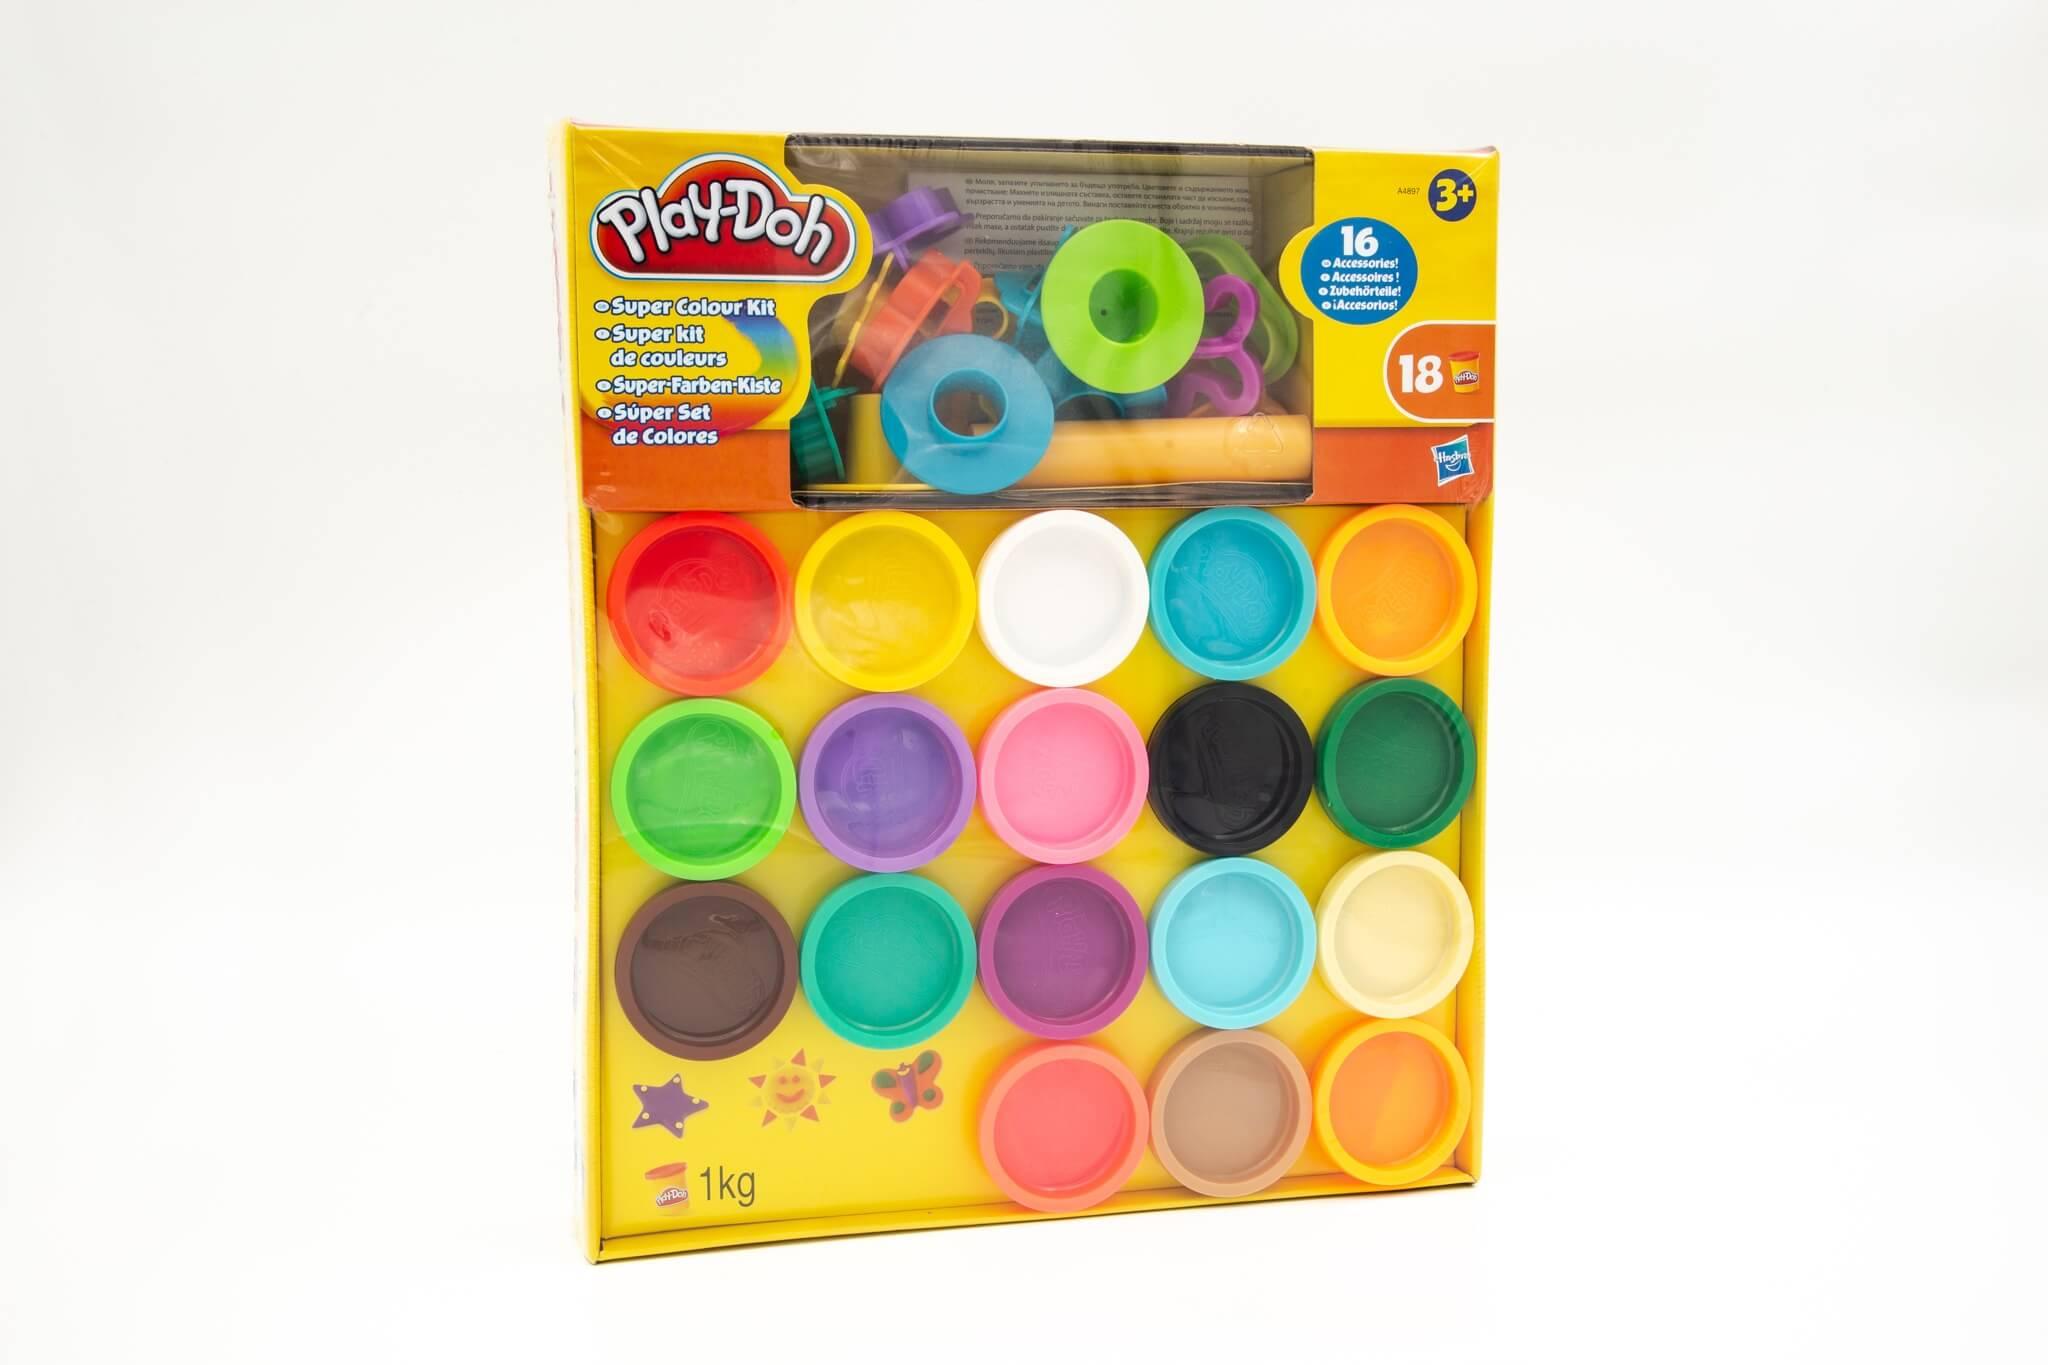 Hasbro Play Doh super kutija plastelina sa dodacima